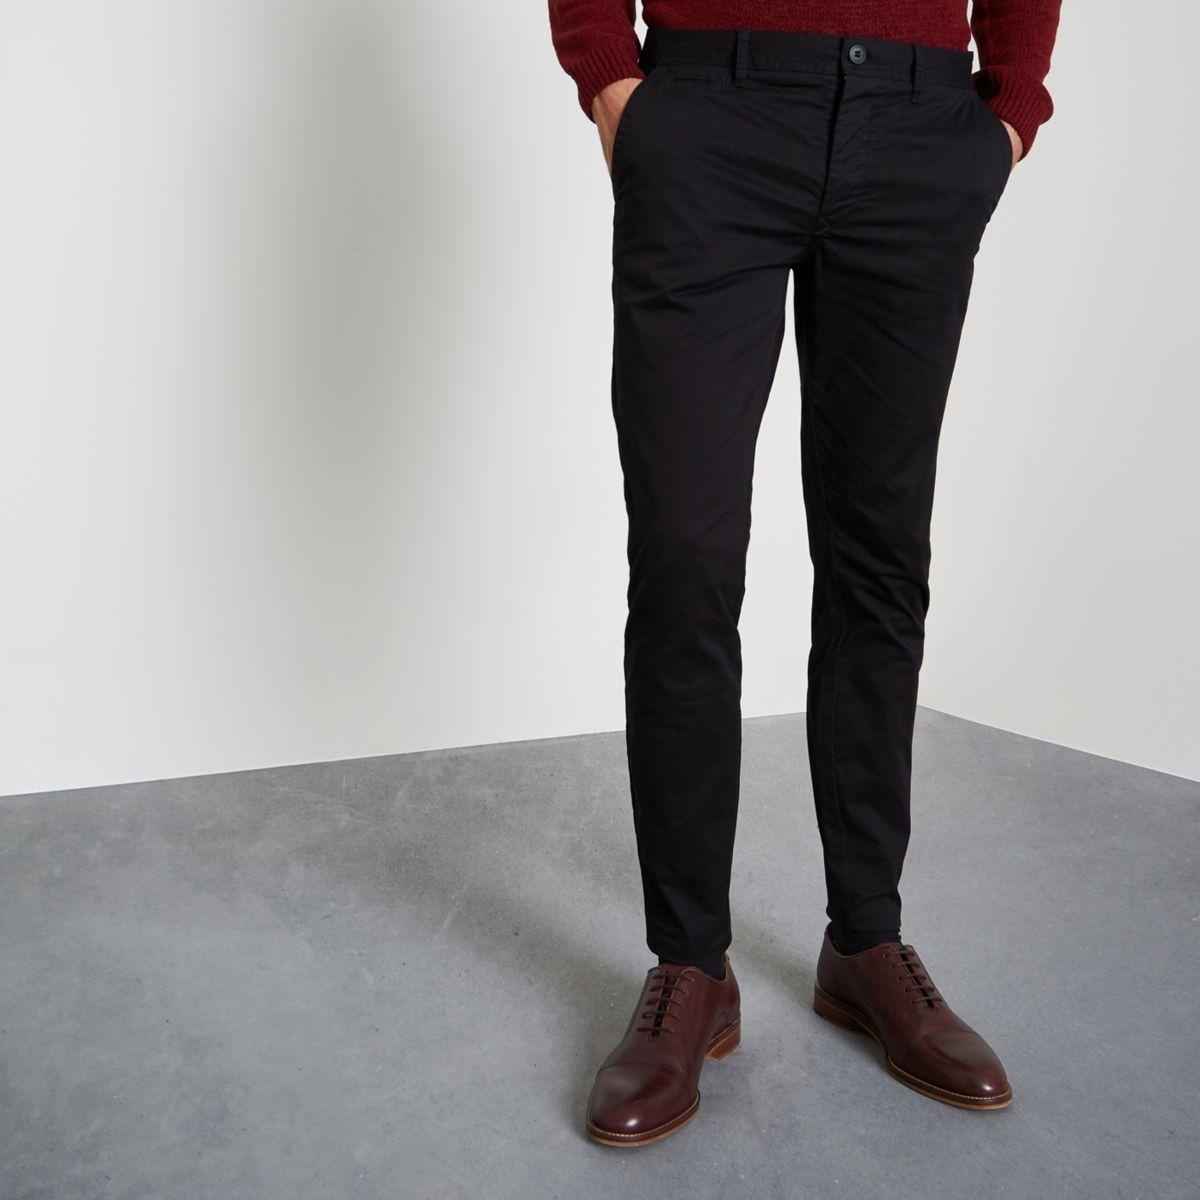 Black super skinny chino trousers